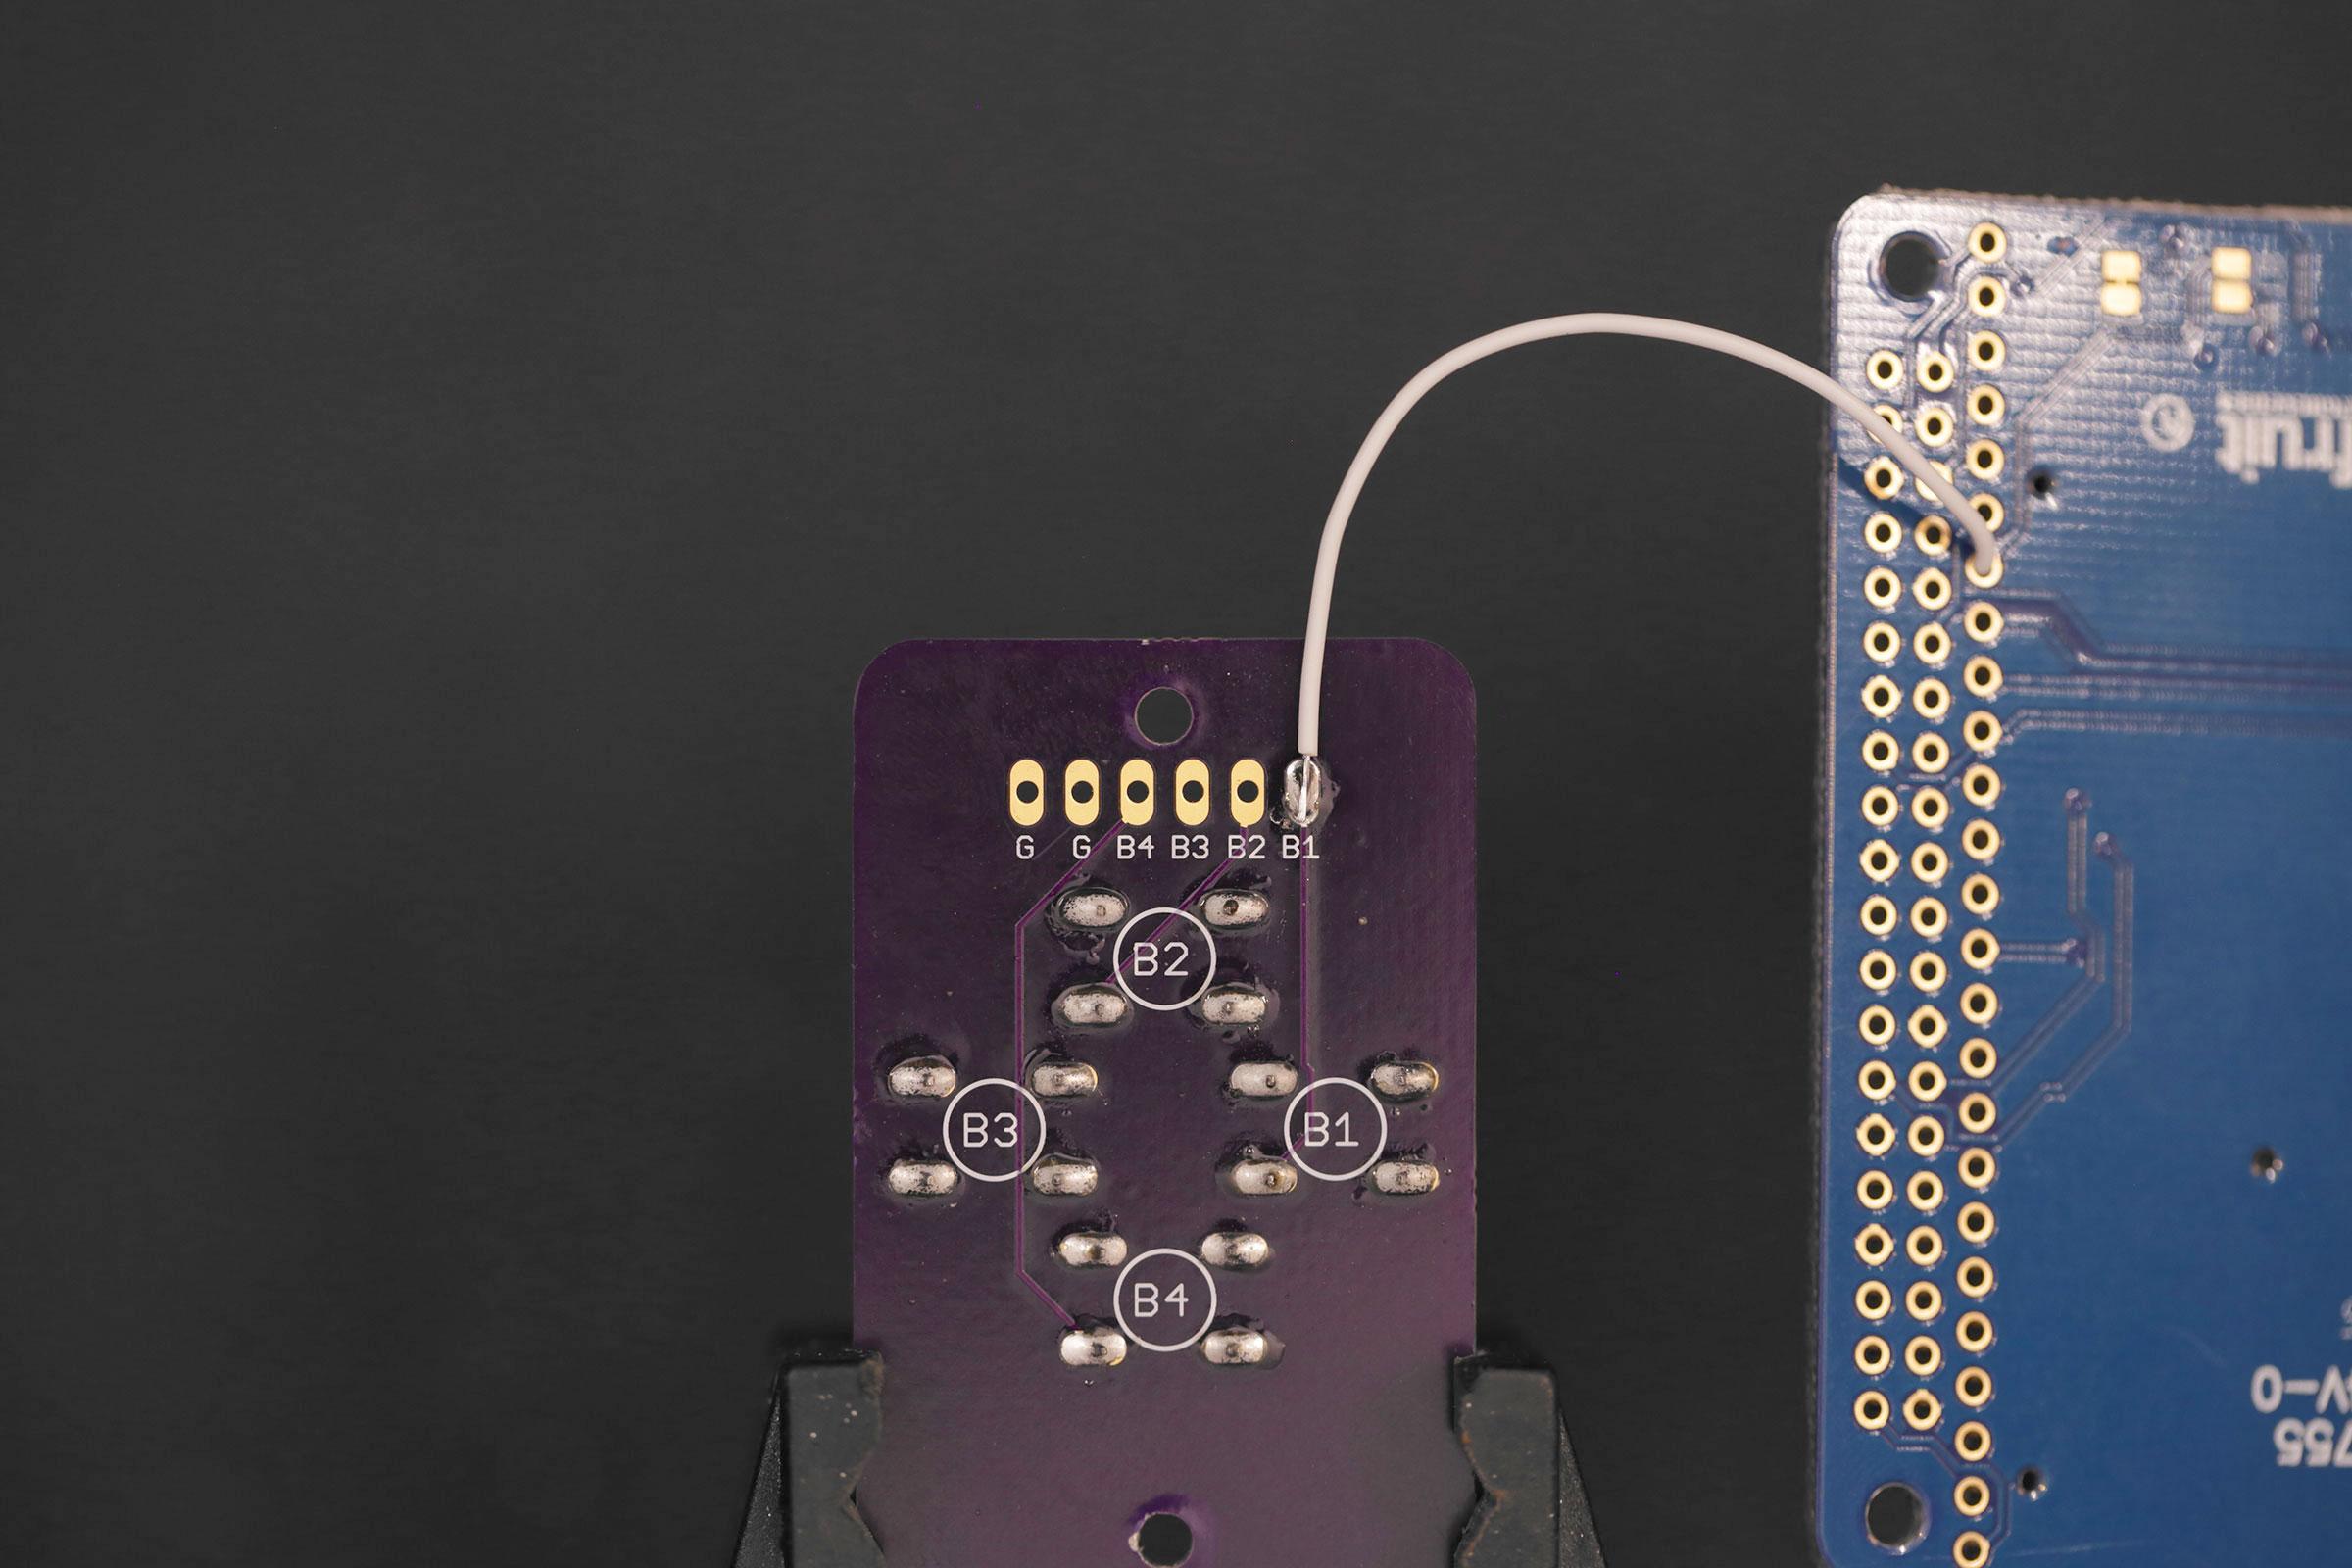 raspberry_pi_gamepad-solder-wire.jpg